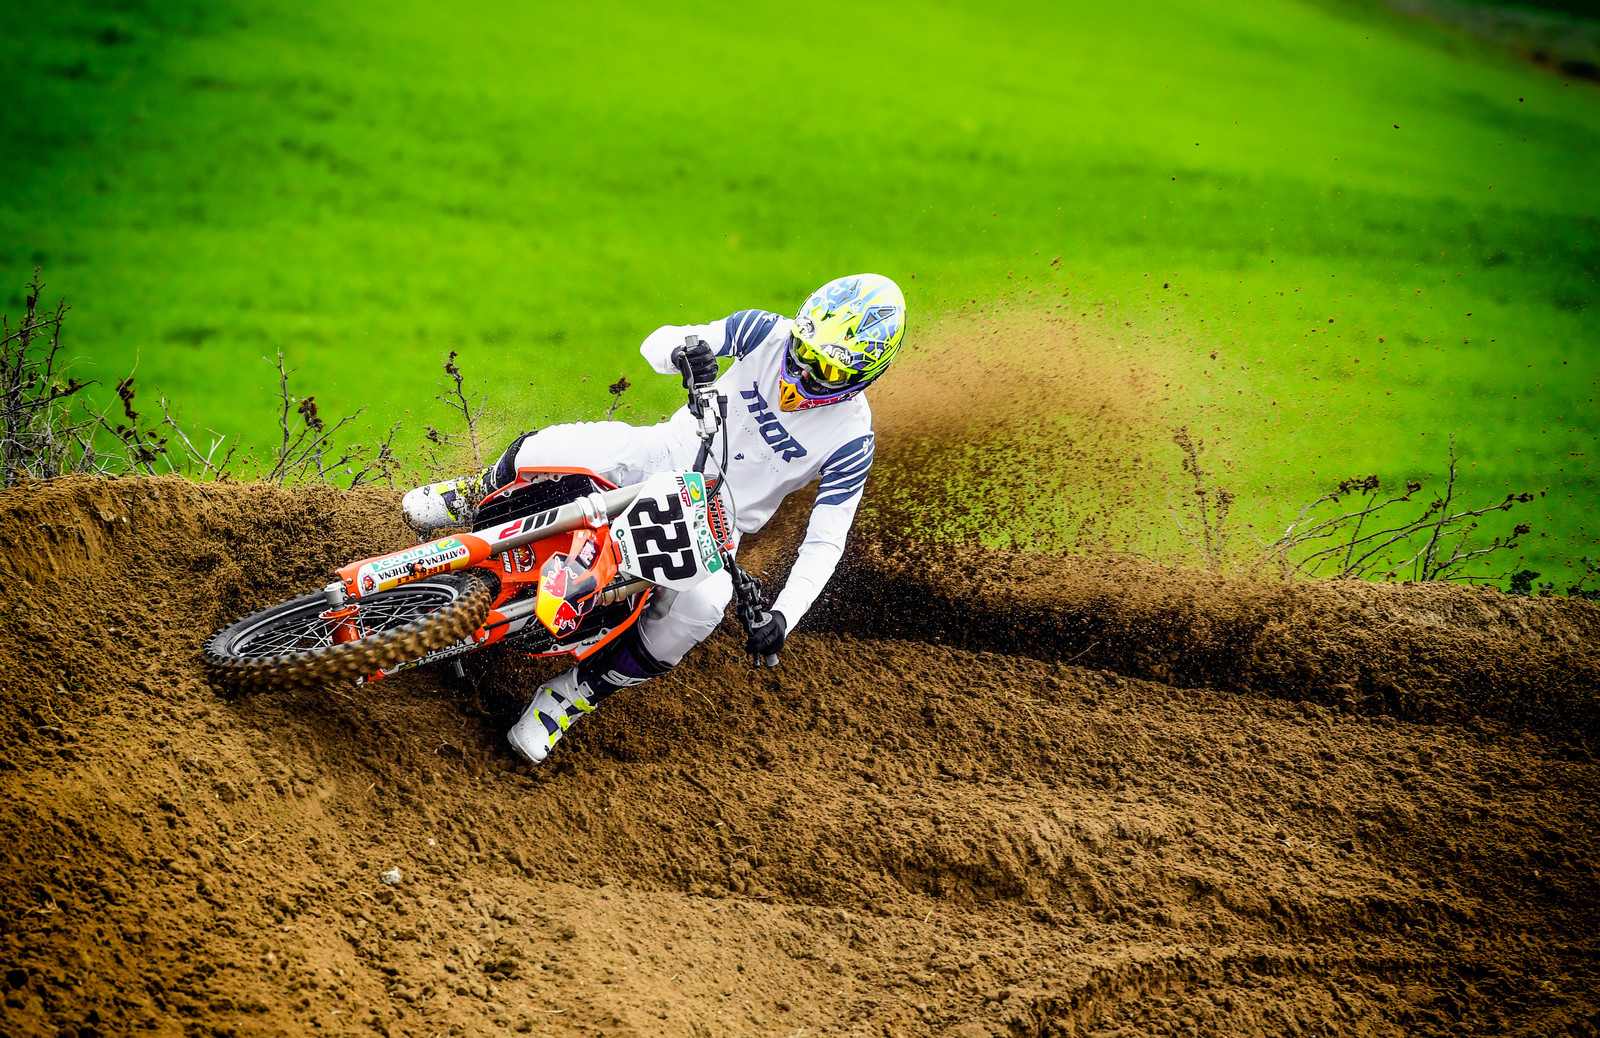 THOR MX Announces Sponsorship of Red Bull KTM Factory MXGP Race Team